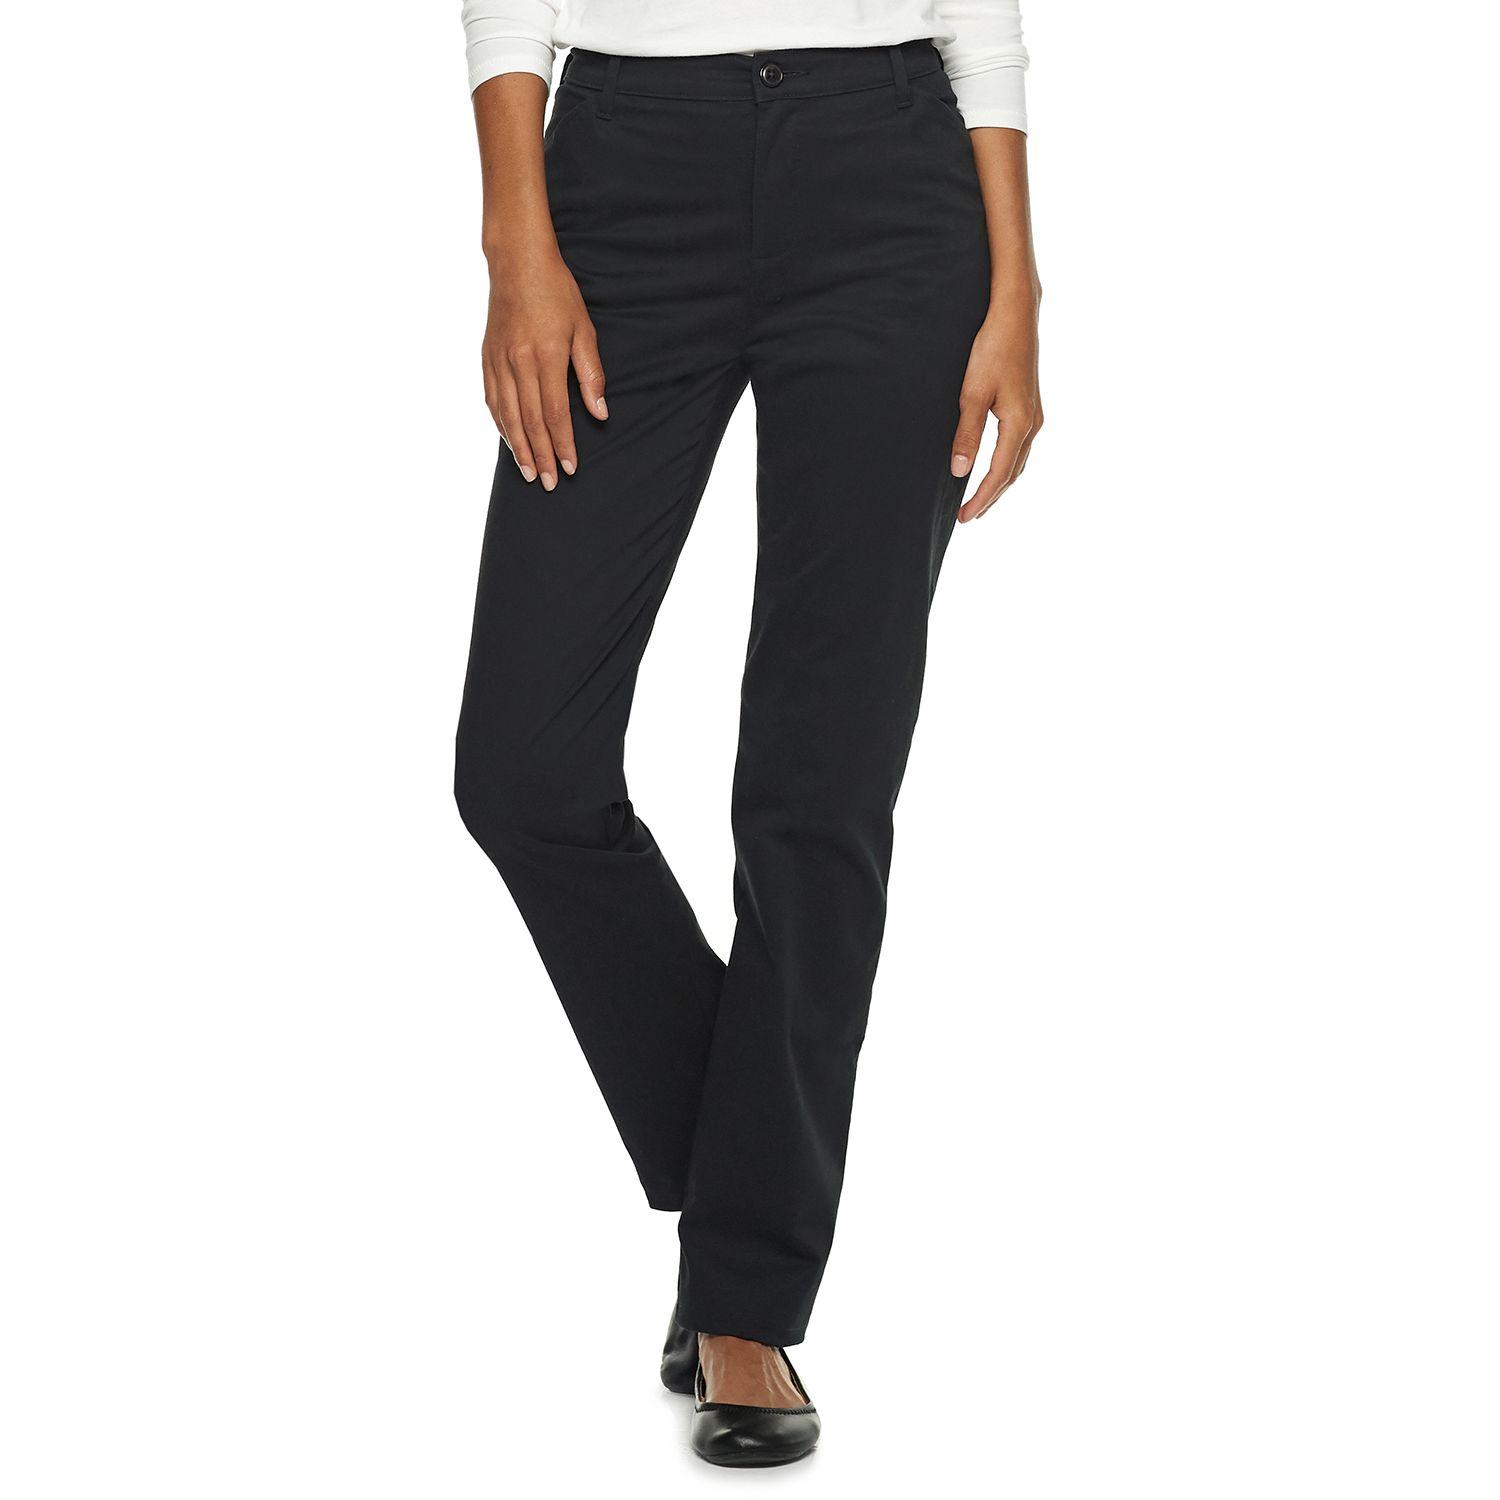 Lee Womens Regular Fit Straight Leg Utility Ankle Pant Pants